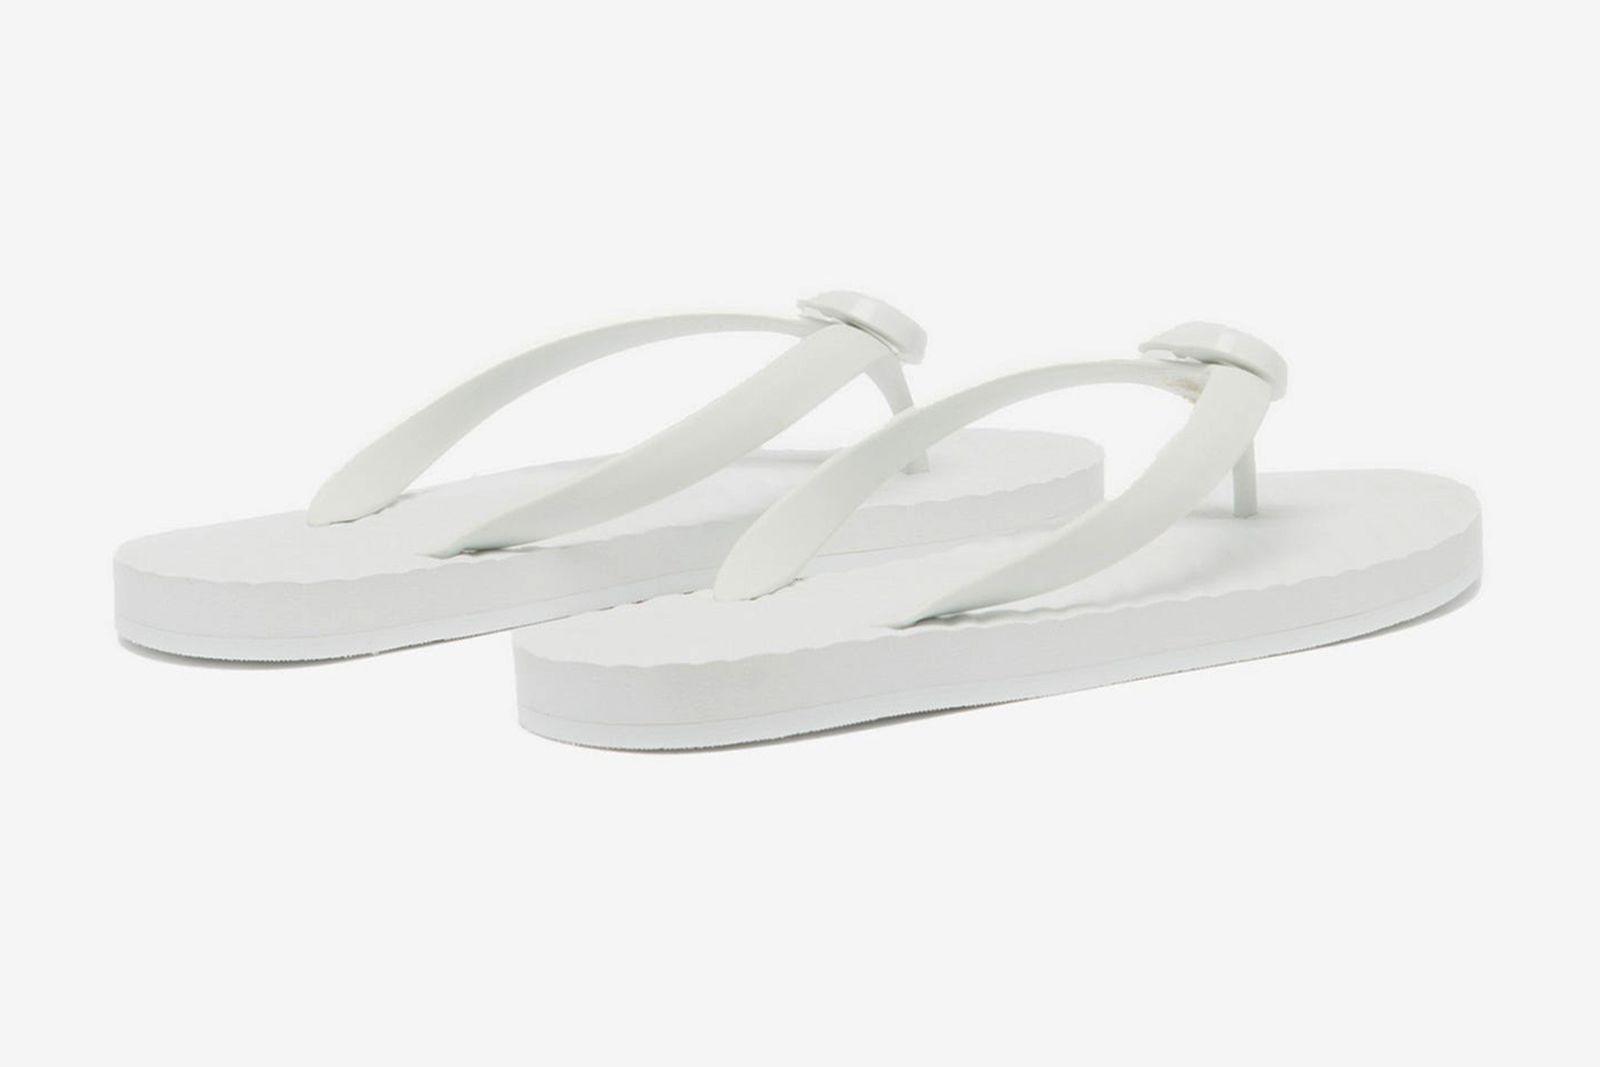 gucci flip flop sandals (3)